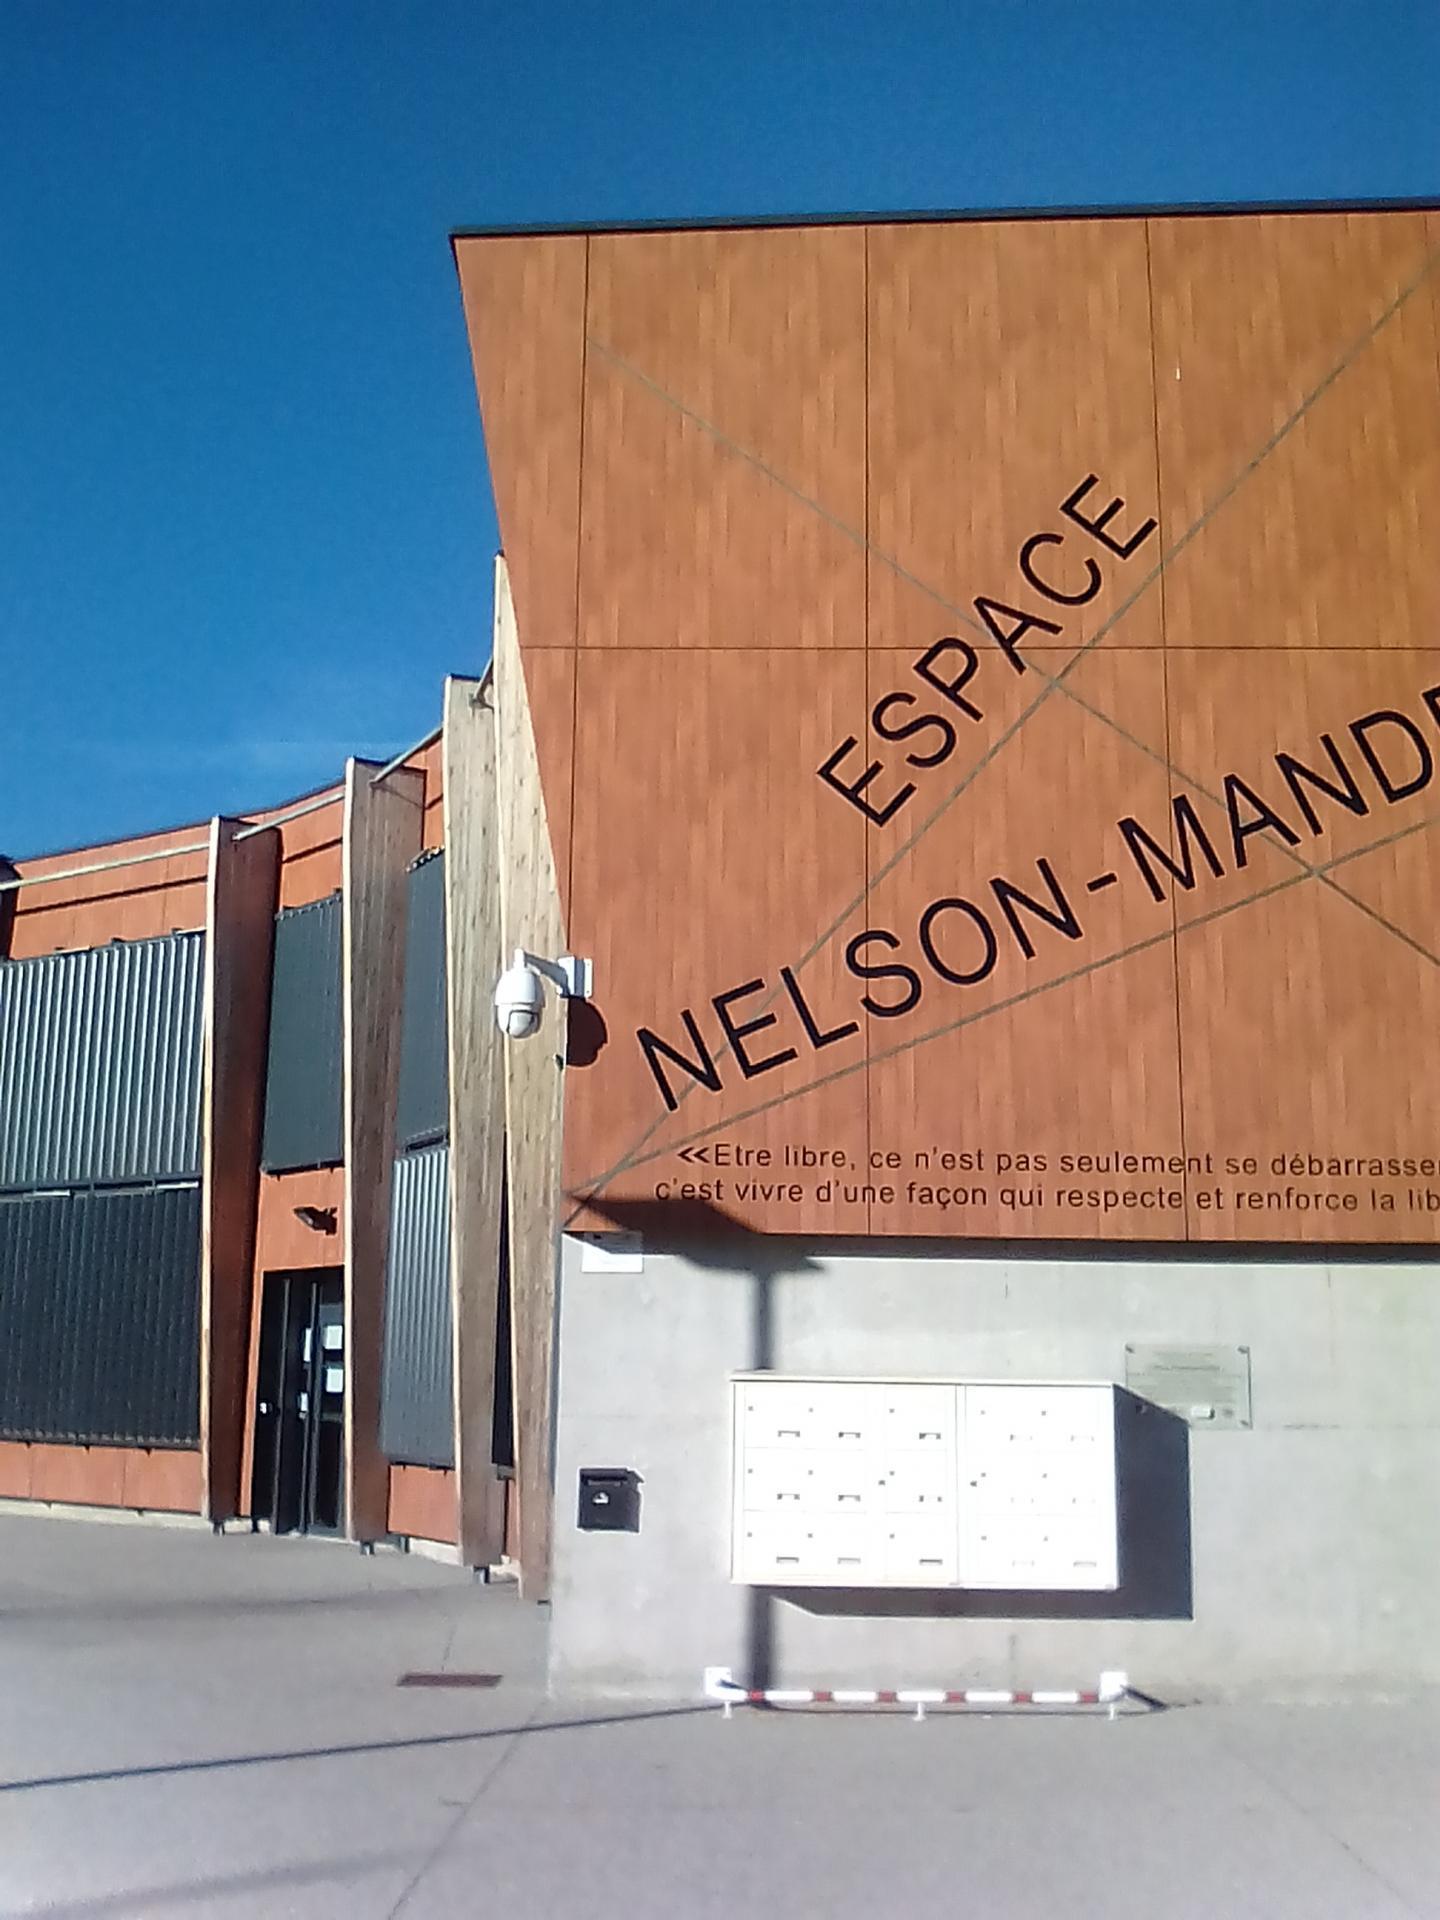 Espace Nelson Mandela, Clermont-Ferrand